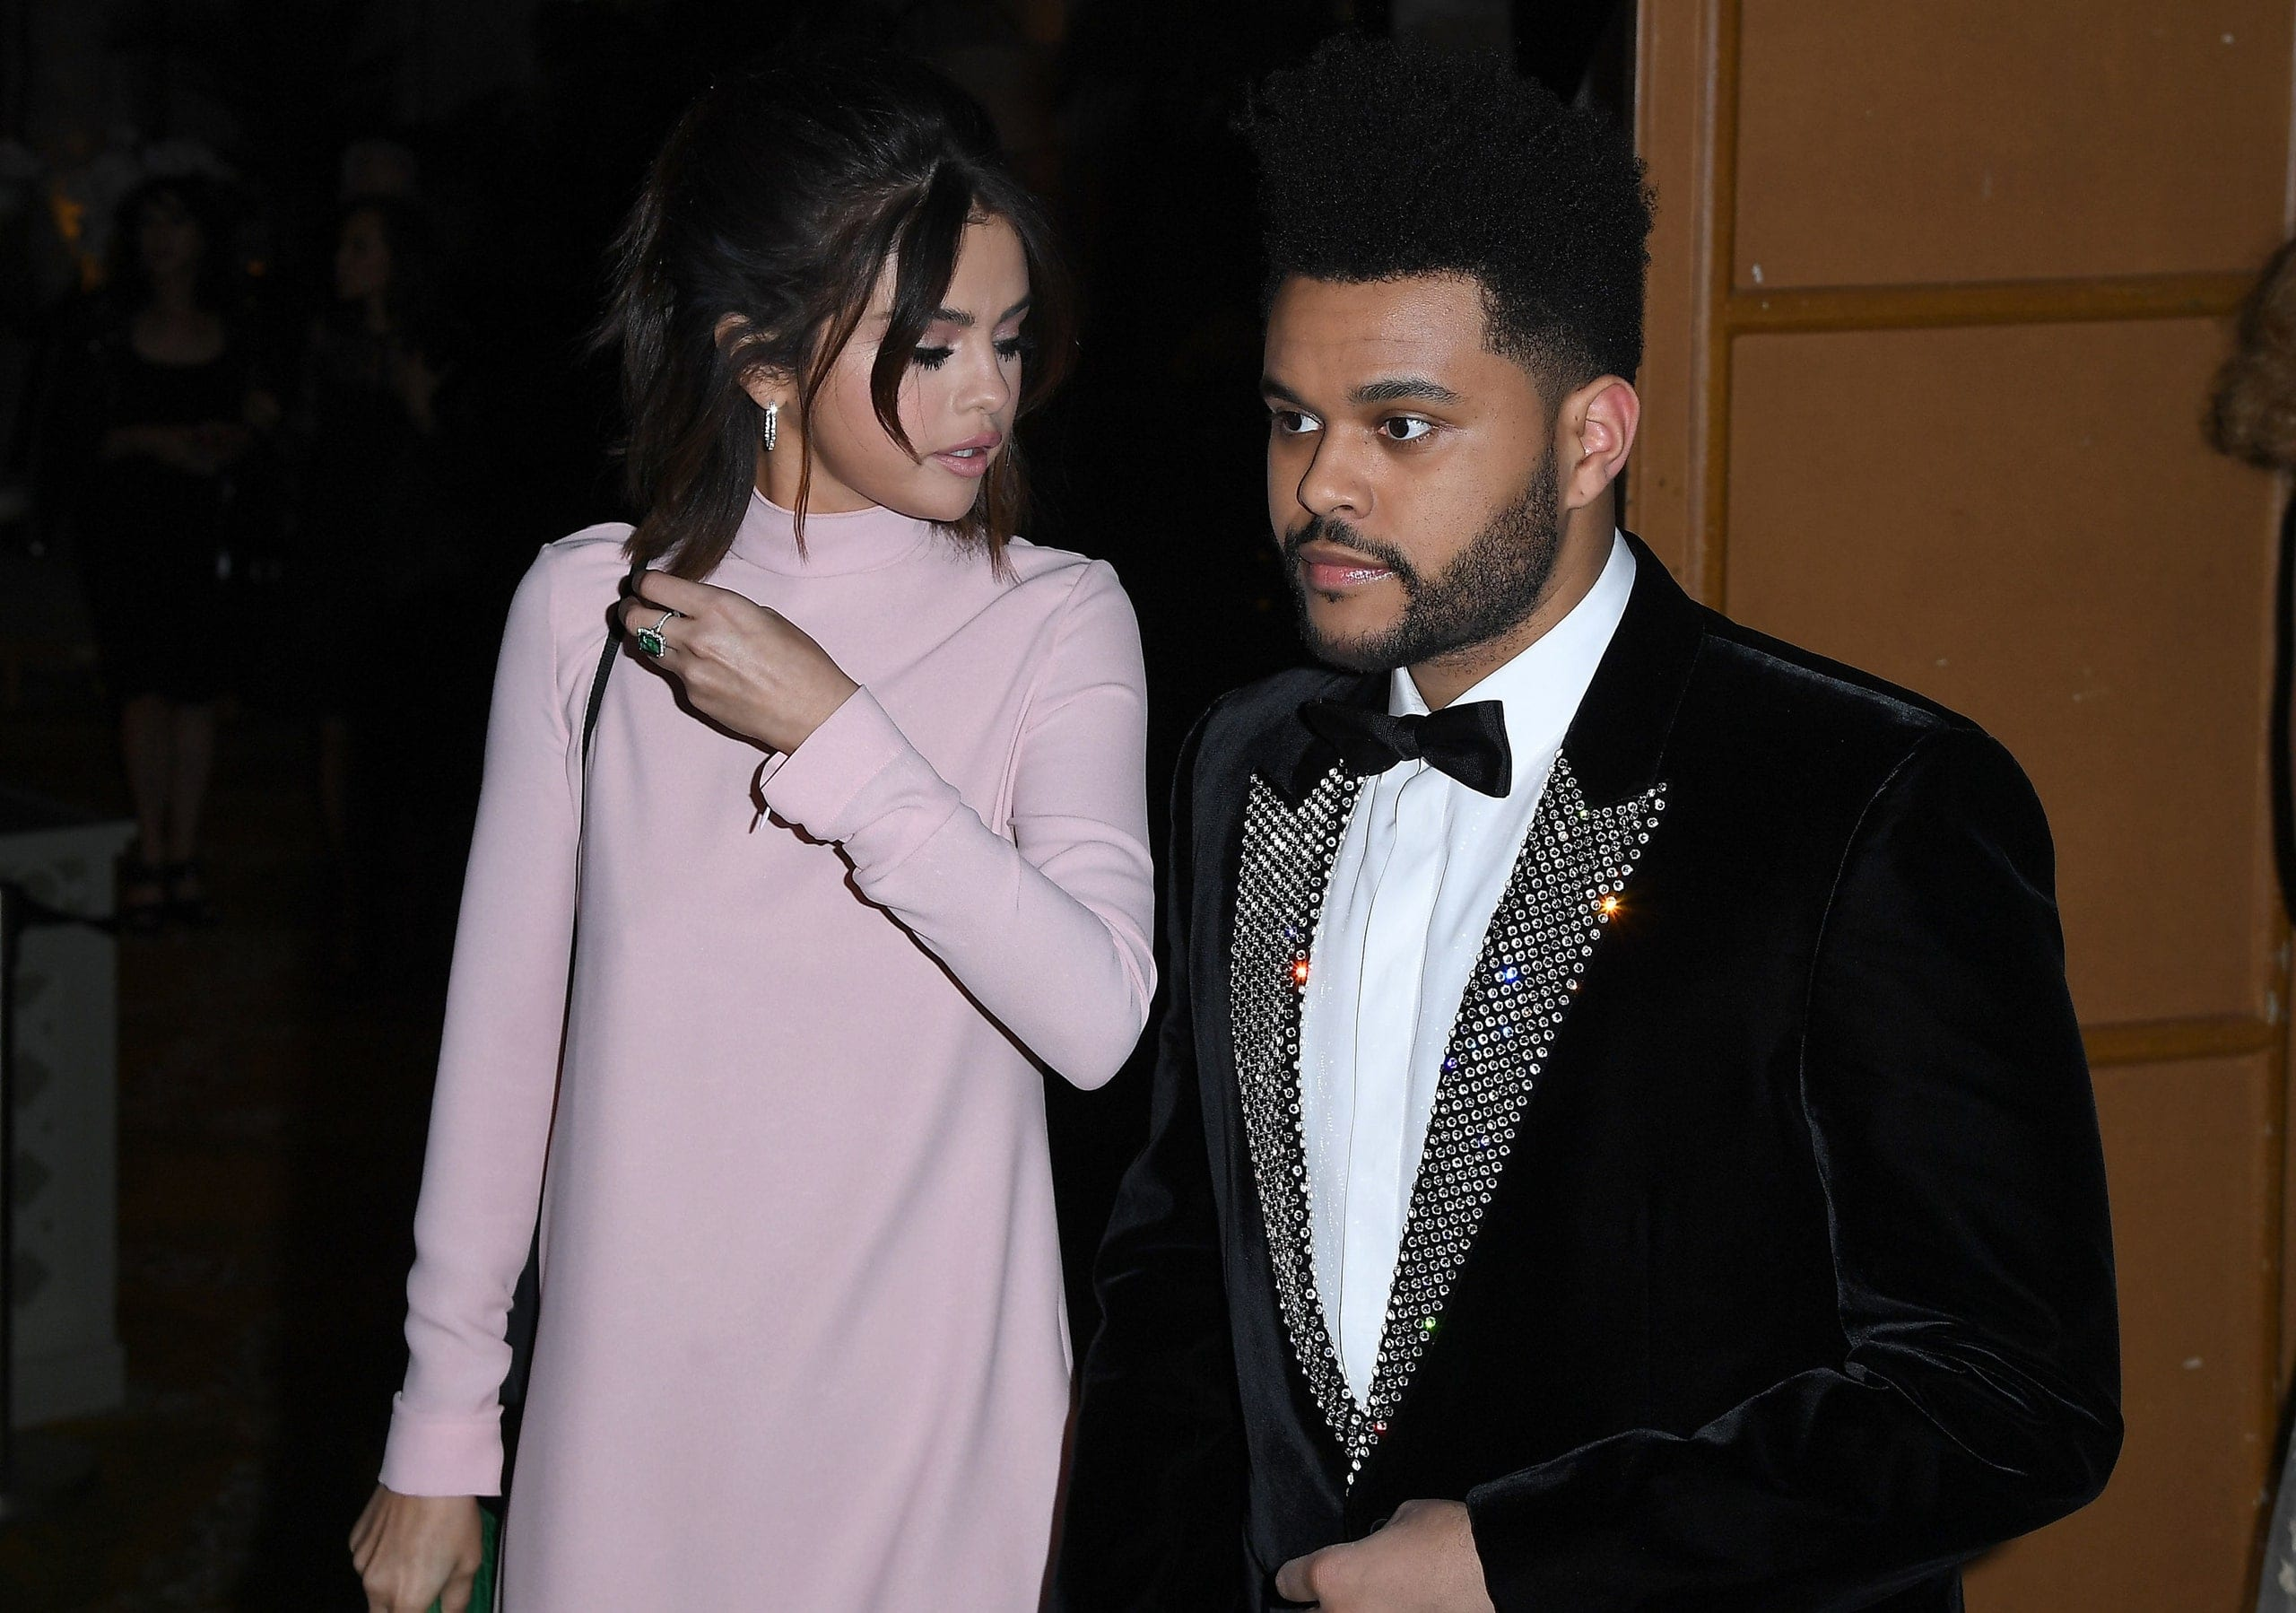 Why Did Selena Gomez And The Weeknd Break Up?